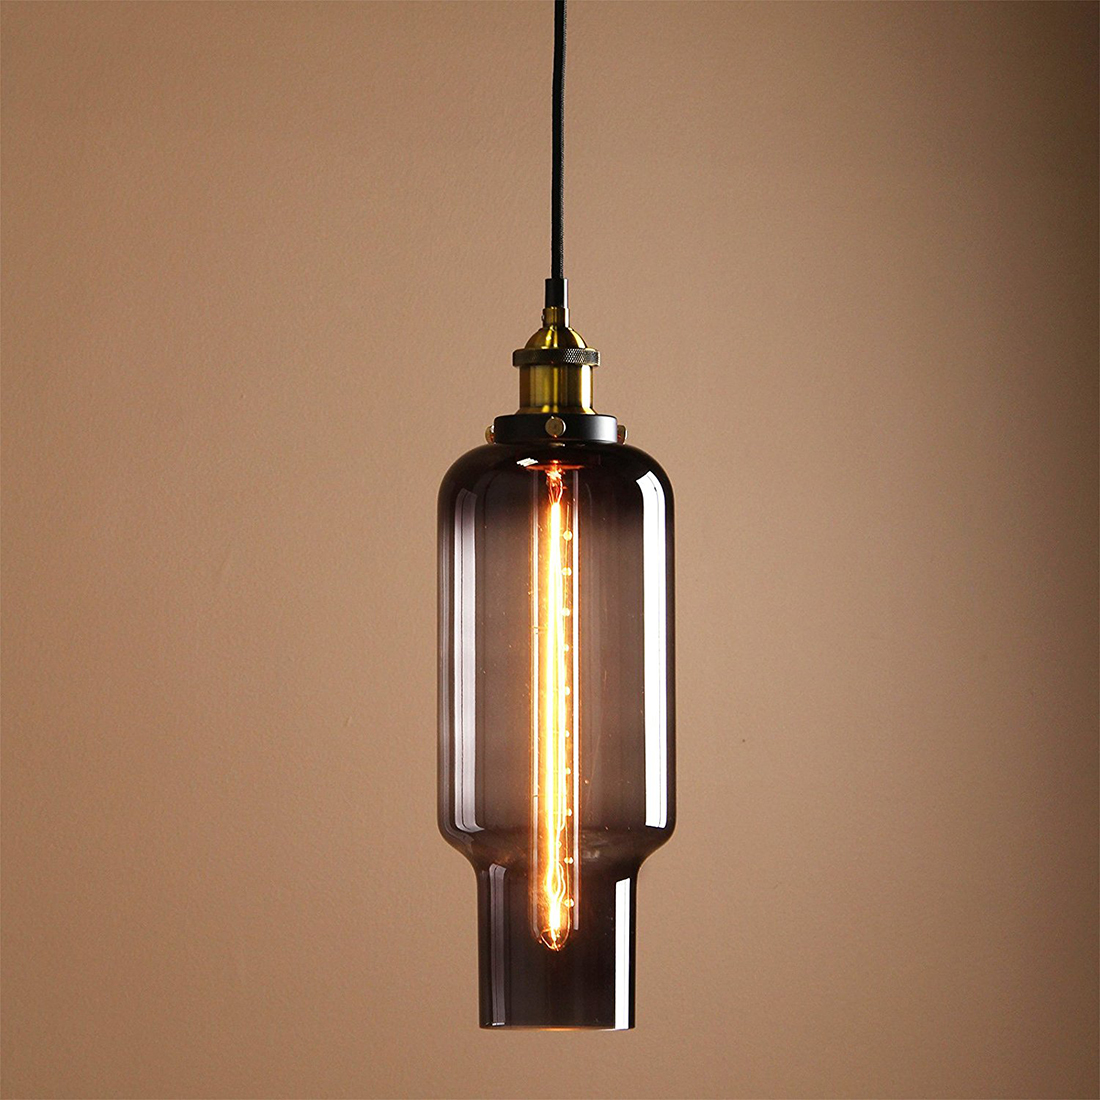 Vintage Industrial Metal Finish Black Gray Glass Shade Loft Pendant Lamp Retro Vintage Light fitting diameter 14cm<br>